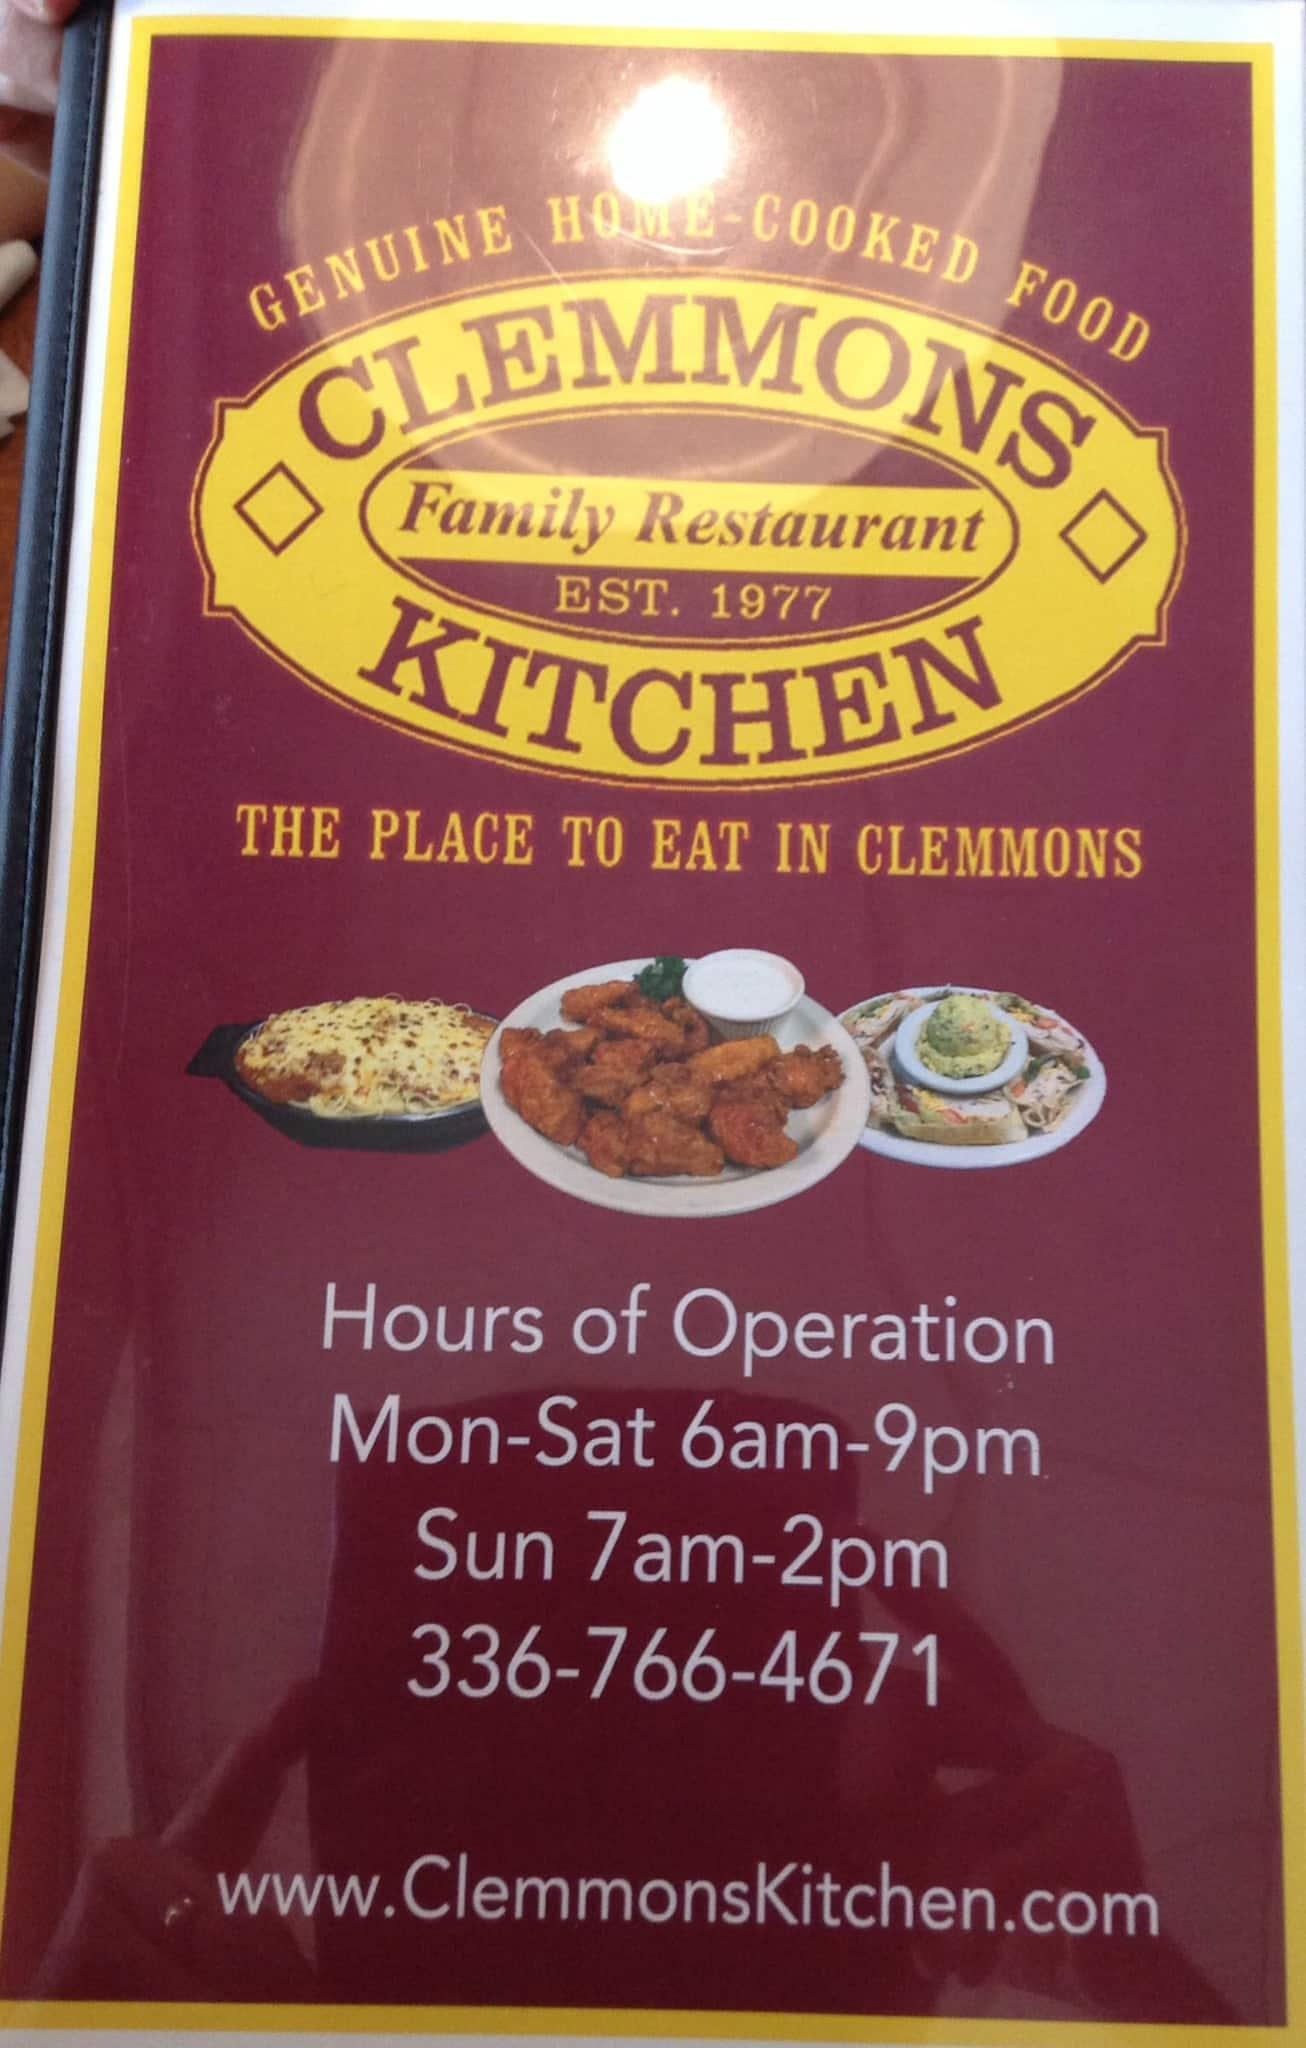 clemmons kitchen - Clemmons Kitchen